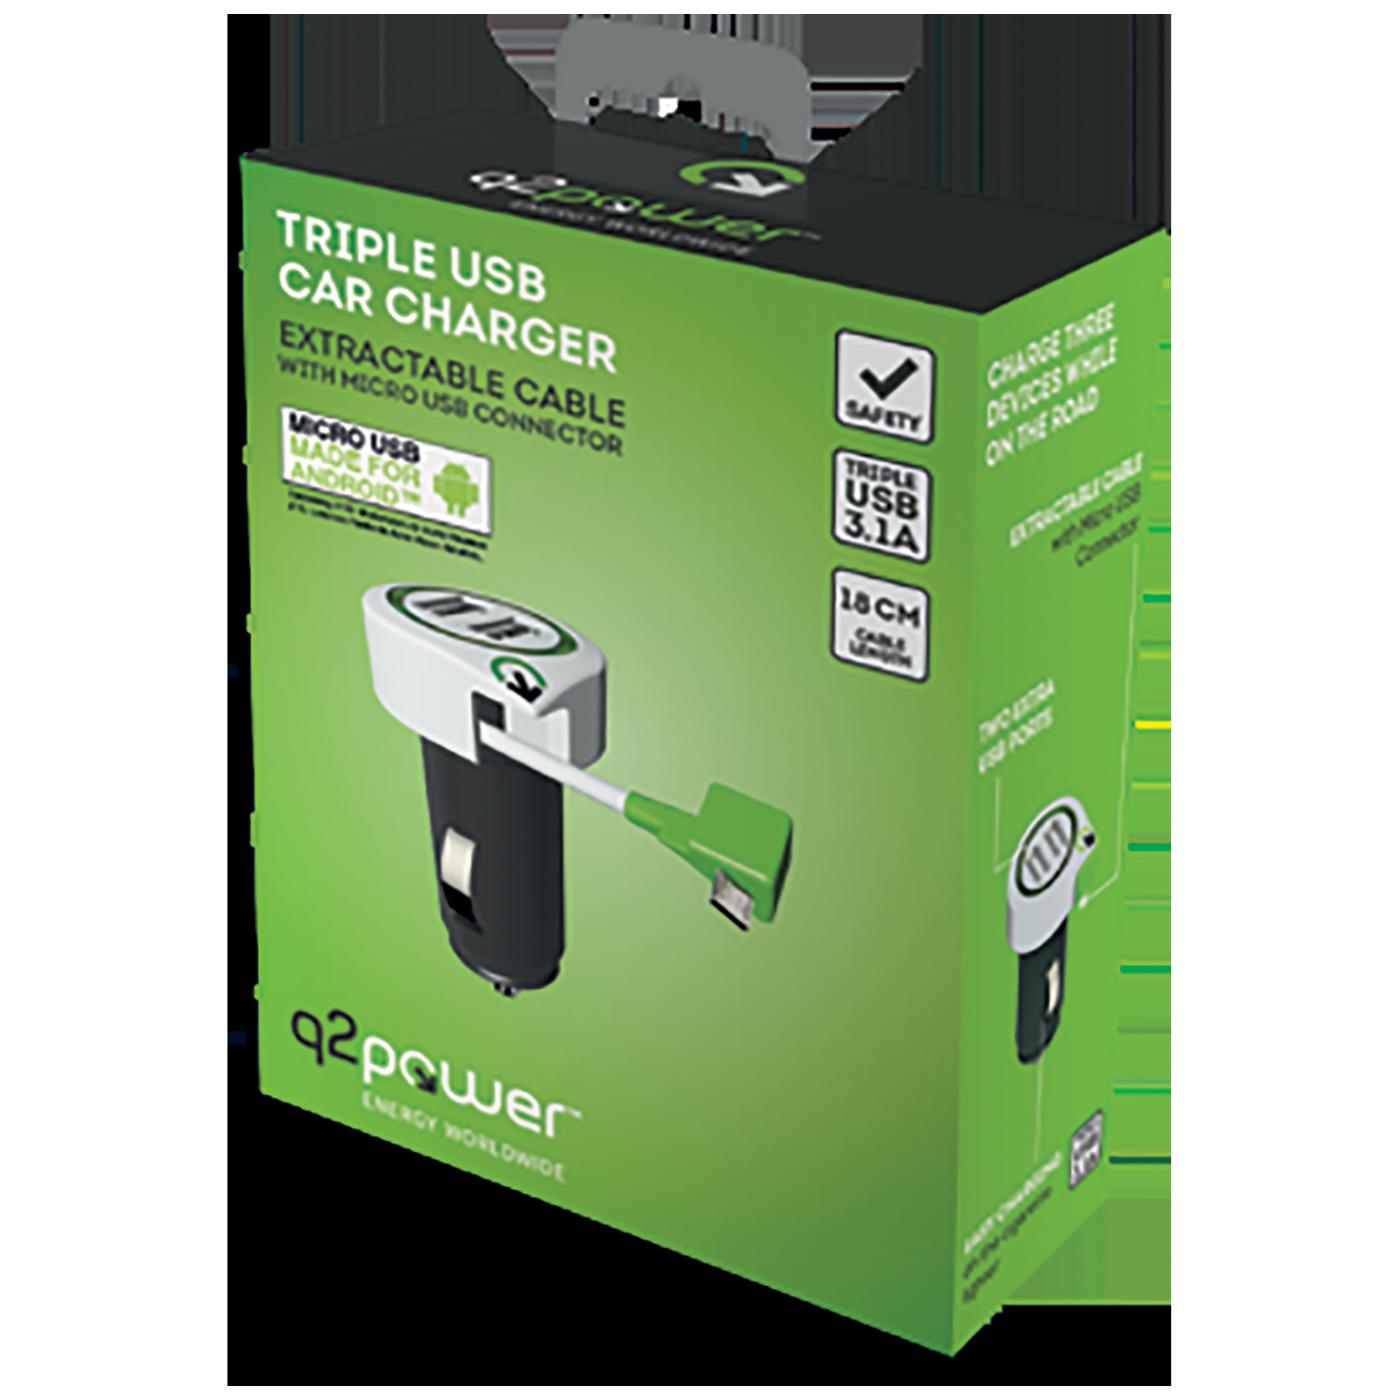 Auto punjač, Dual USB, 3.1A, microUSB